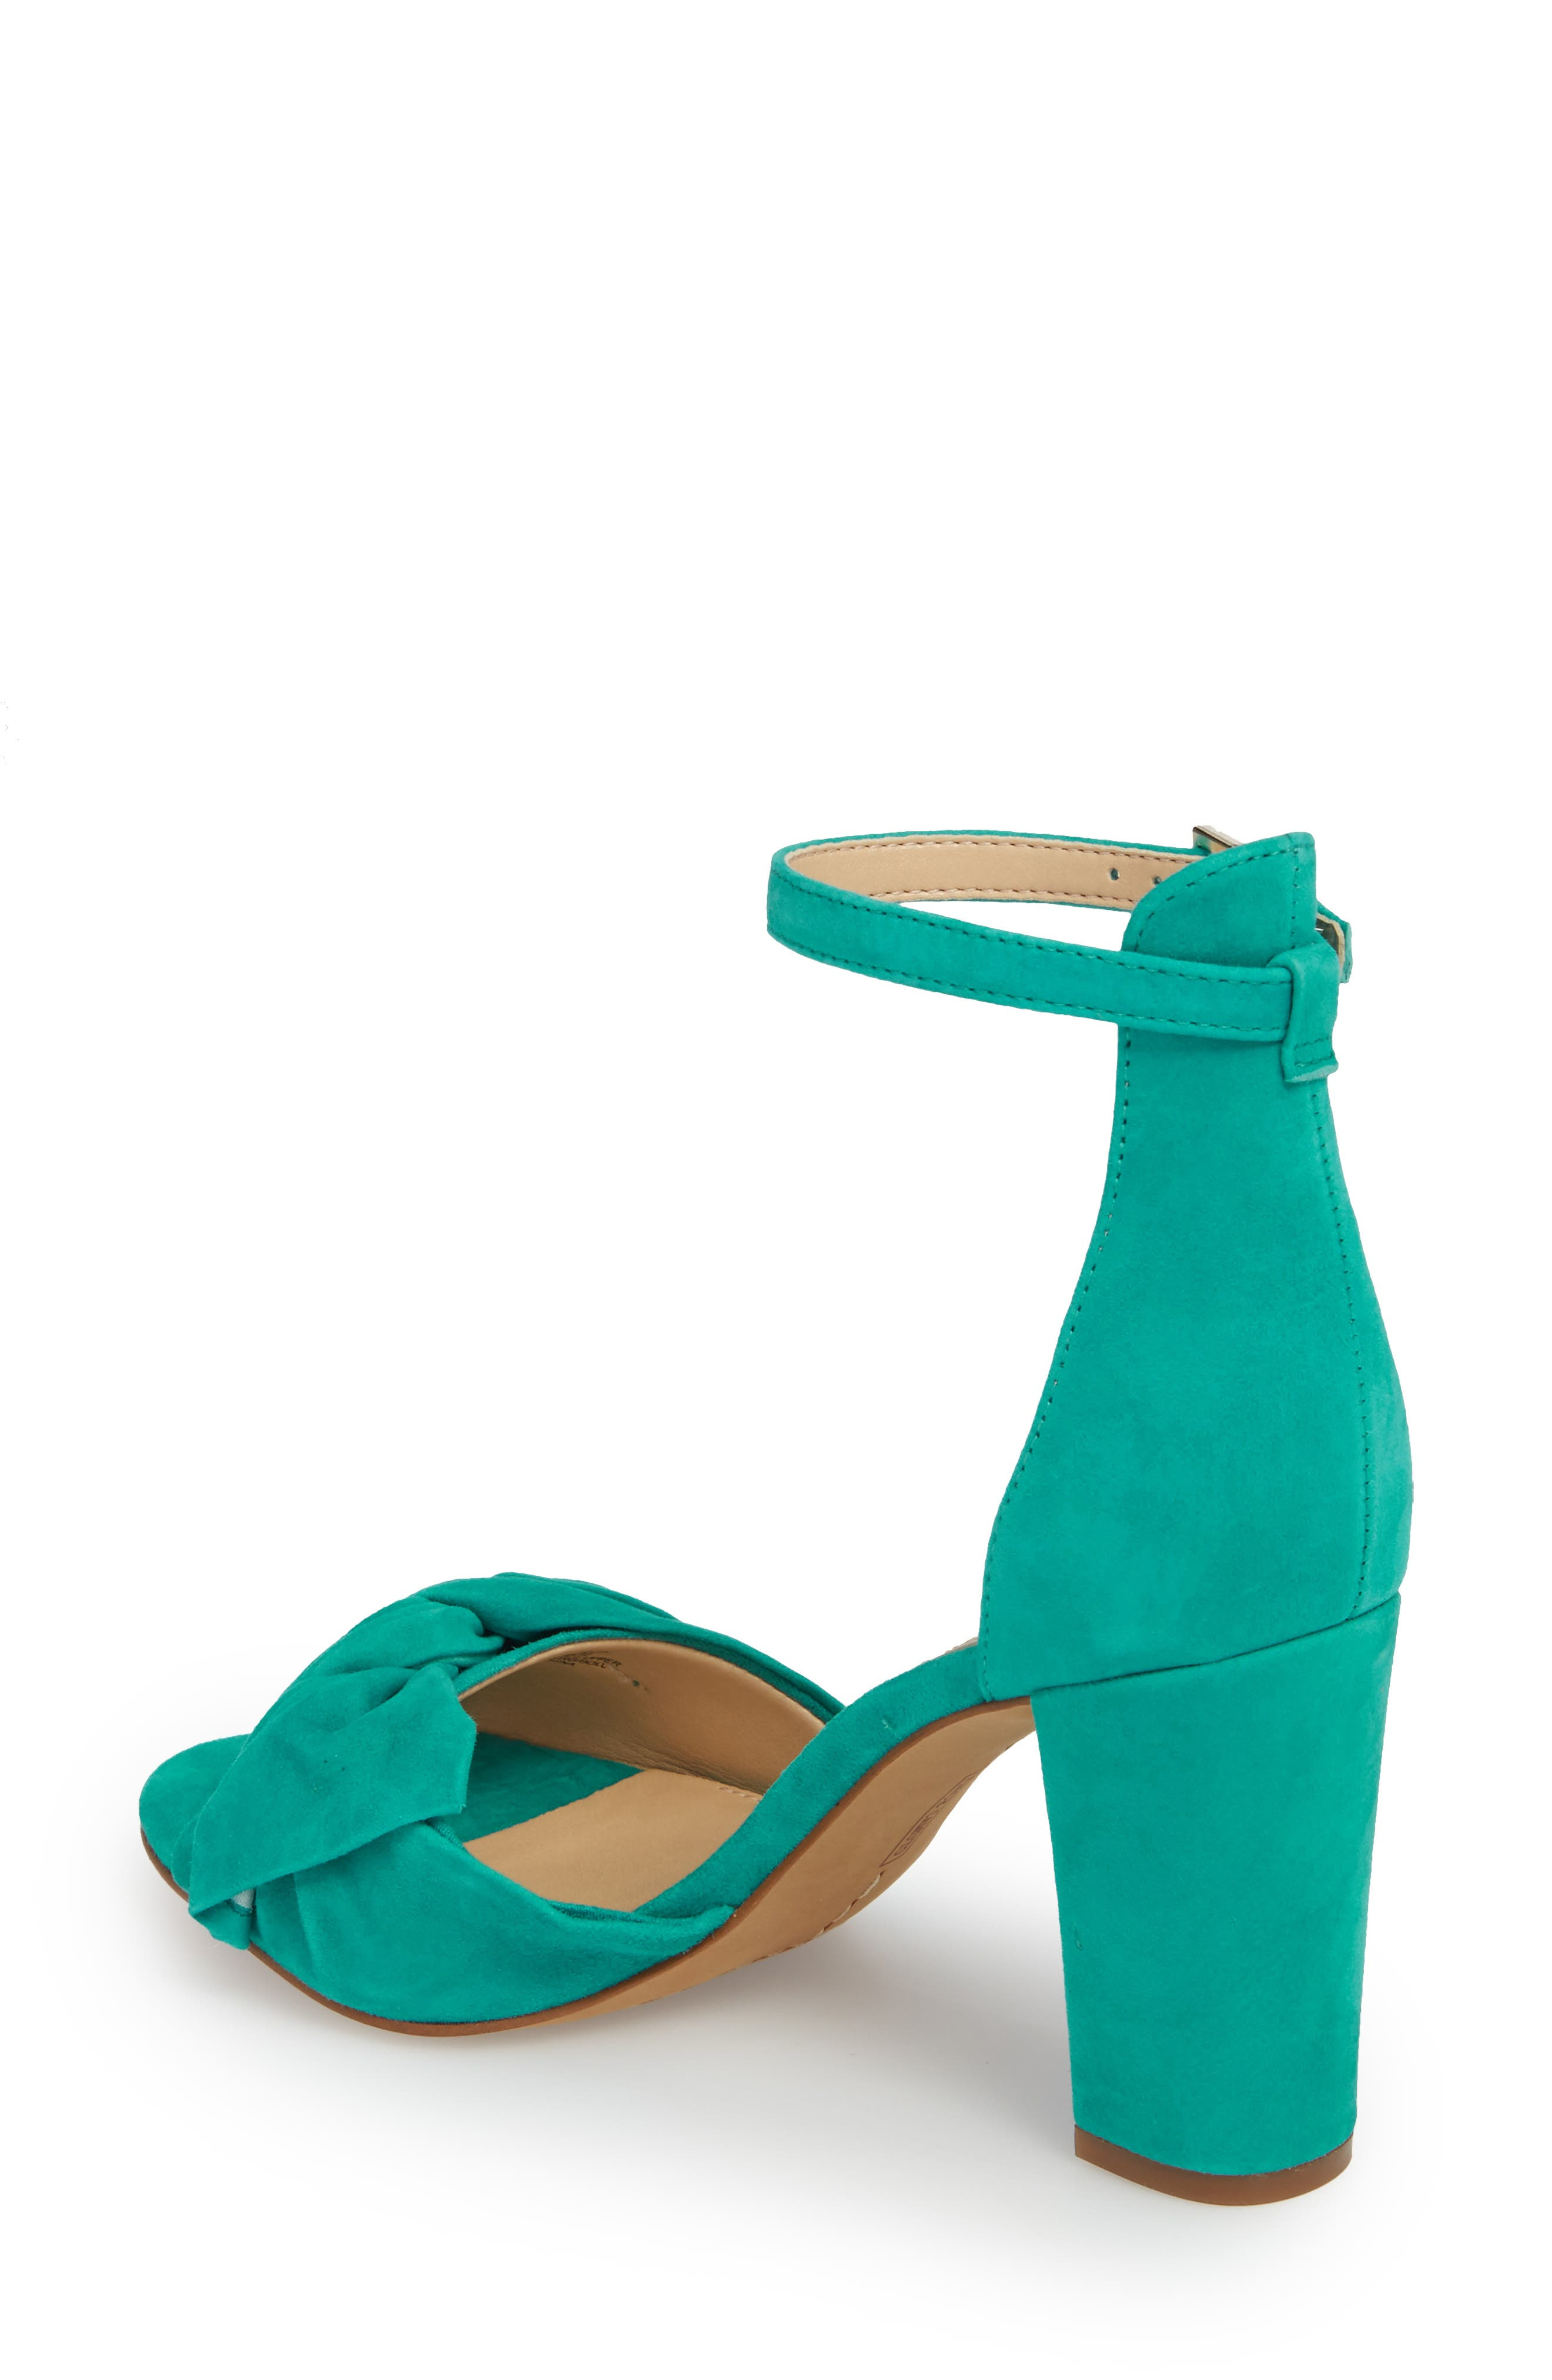 Carrelen Block Heel Sandal,                             Alternate thumbnail 7, color,